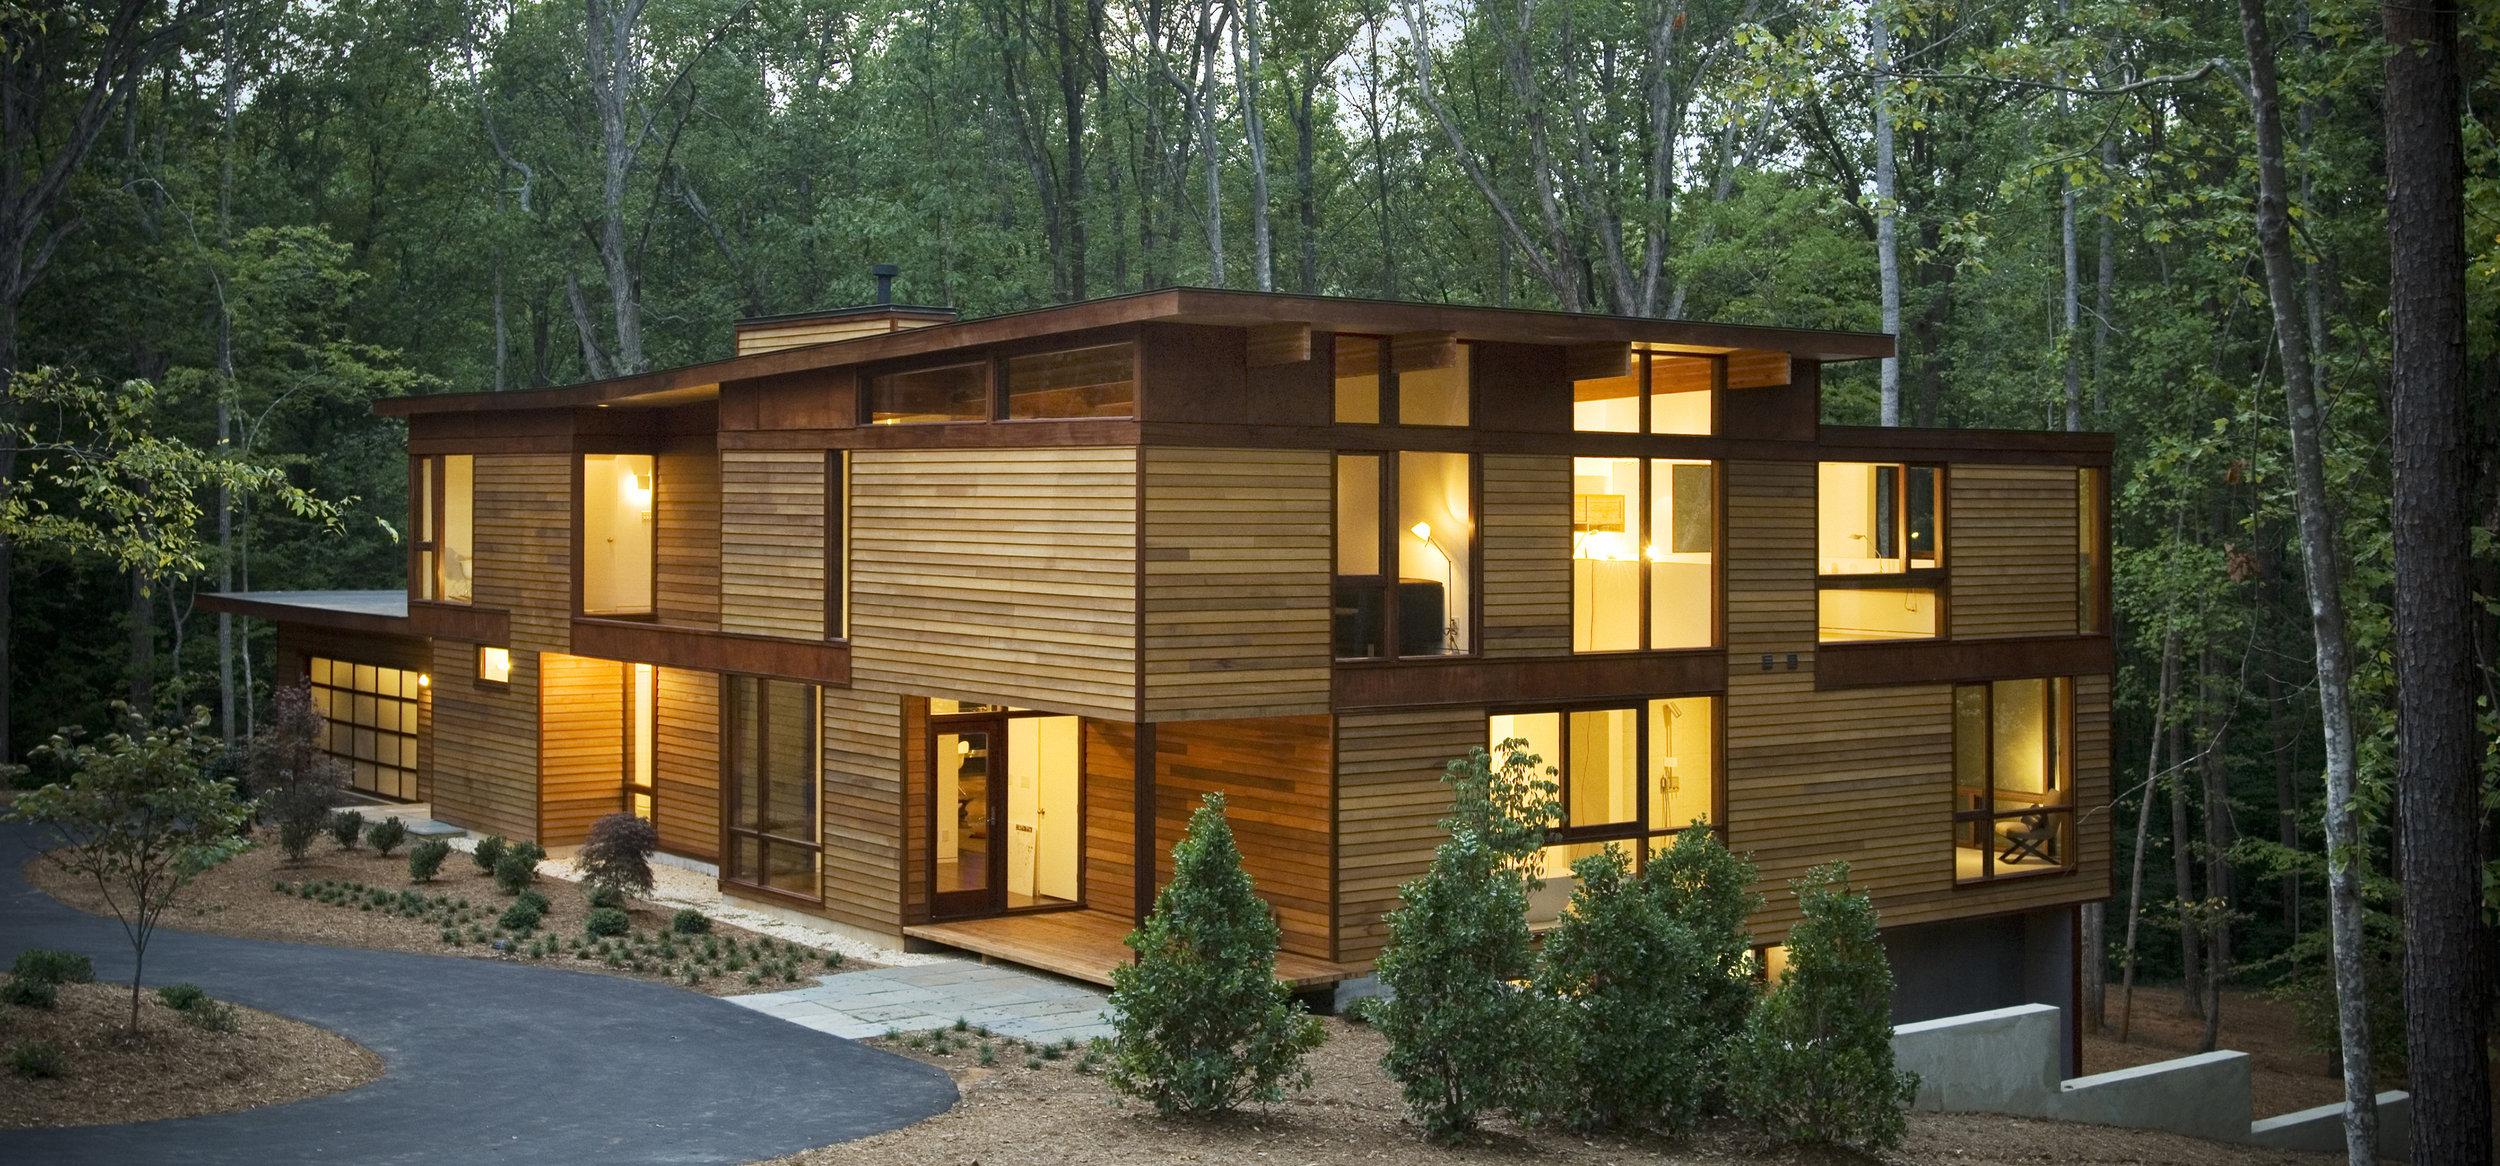 turkel_modern_design_prefab_home_redhill_hillsborough_exterior.jpg